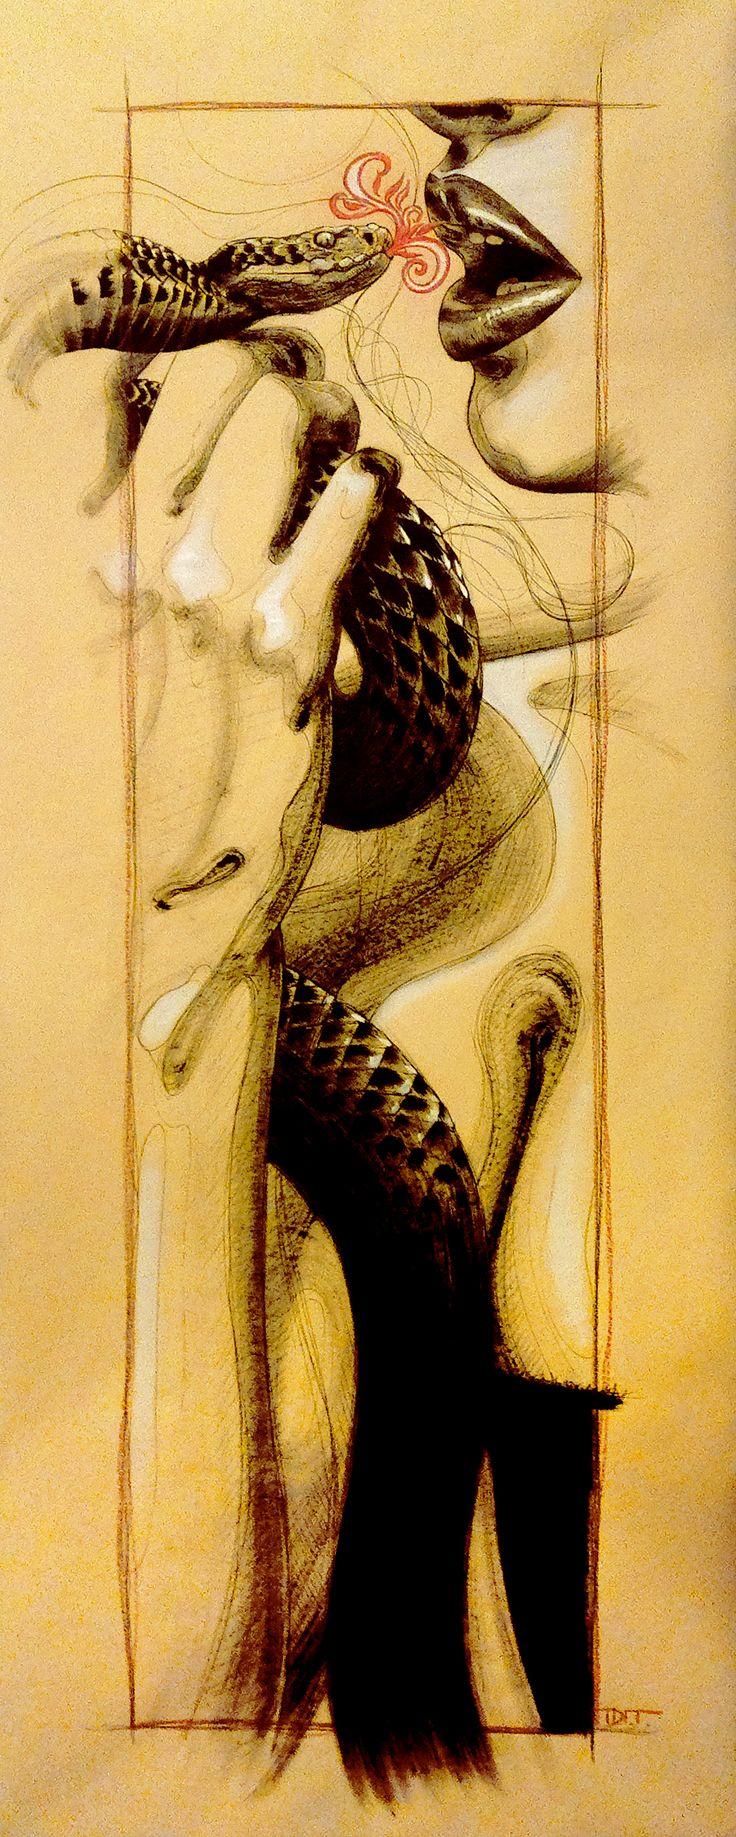 #snake #kiss #woman #lips #sin #originalsin #art #illustration #ink #inkonpaper #dit #diegotoscani #santamargheritaartist